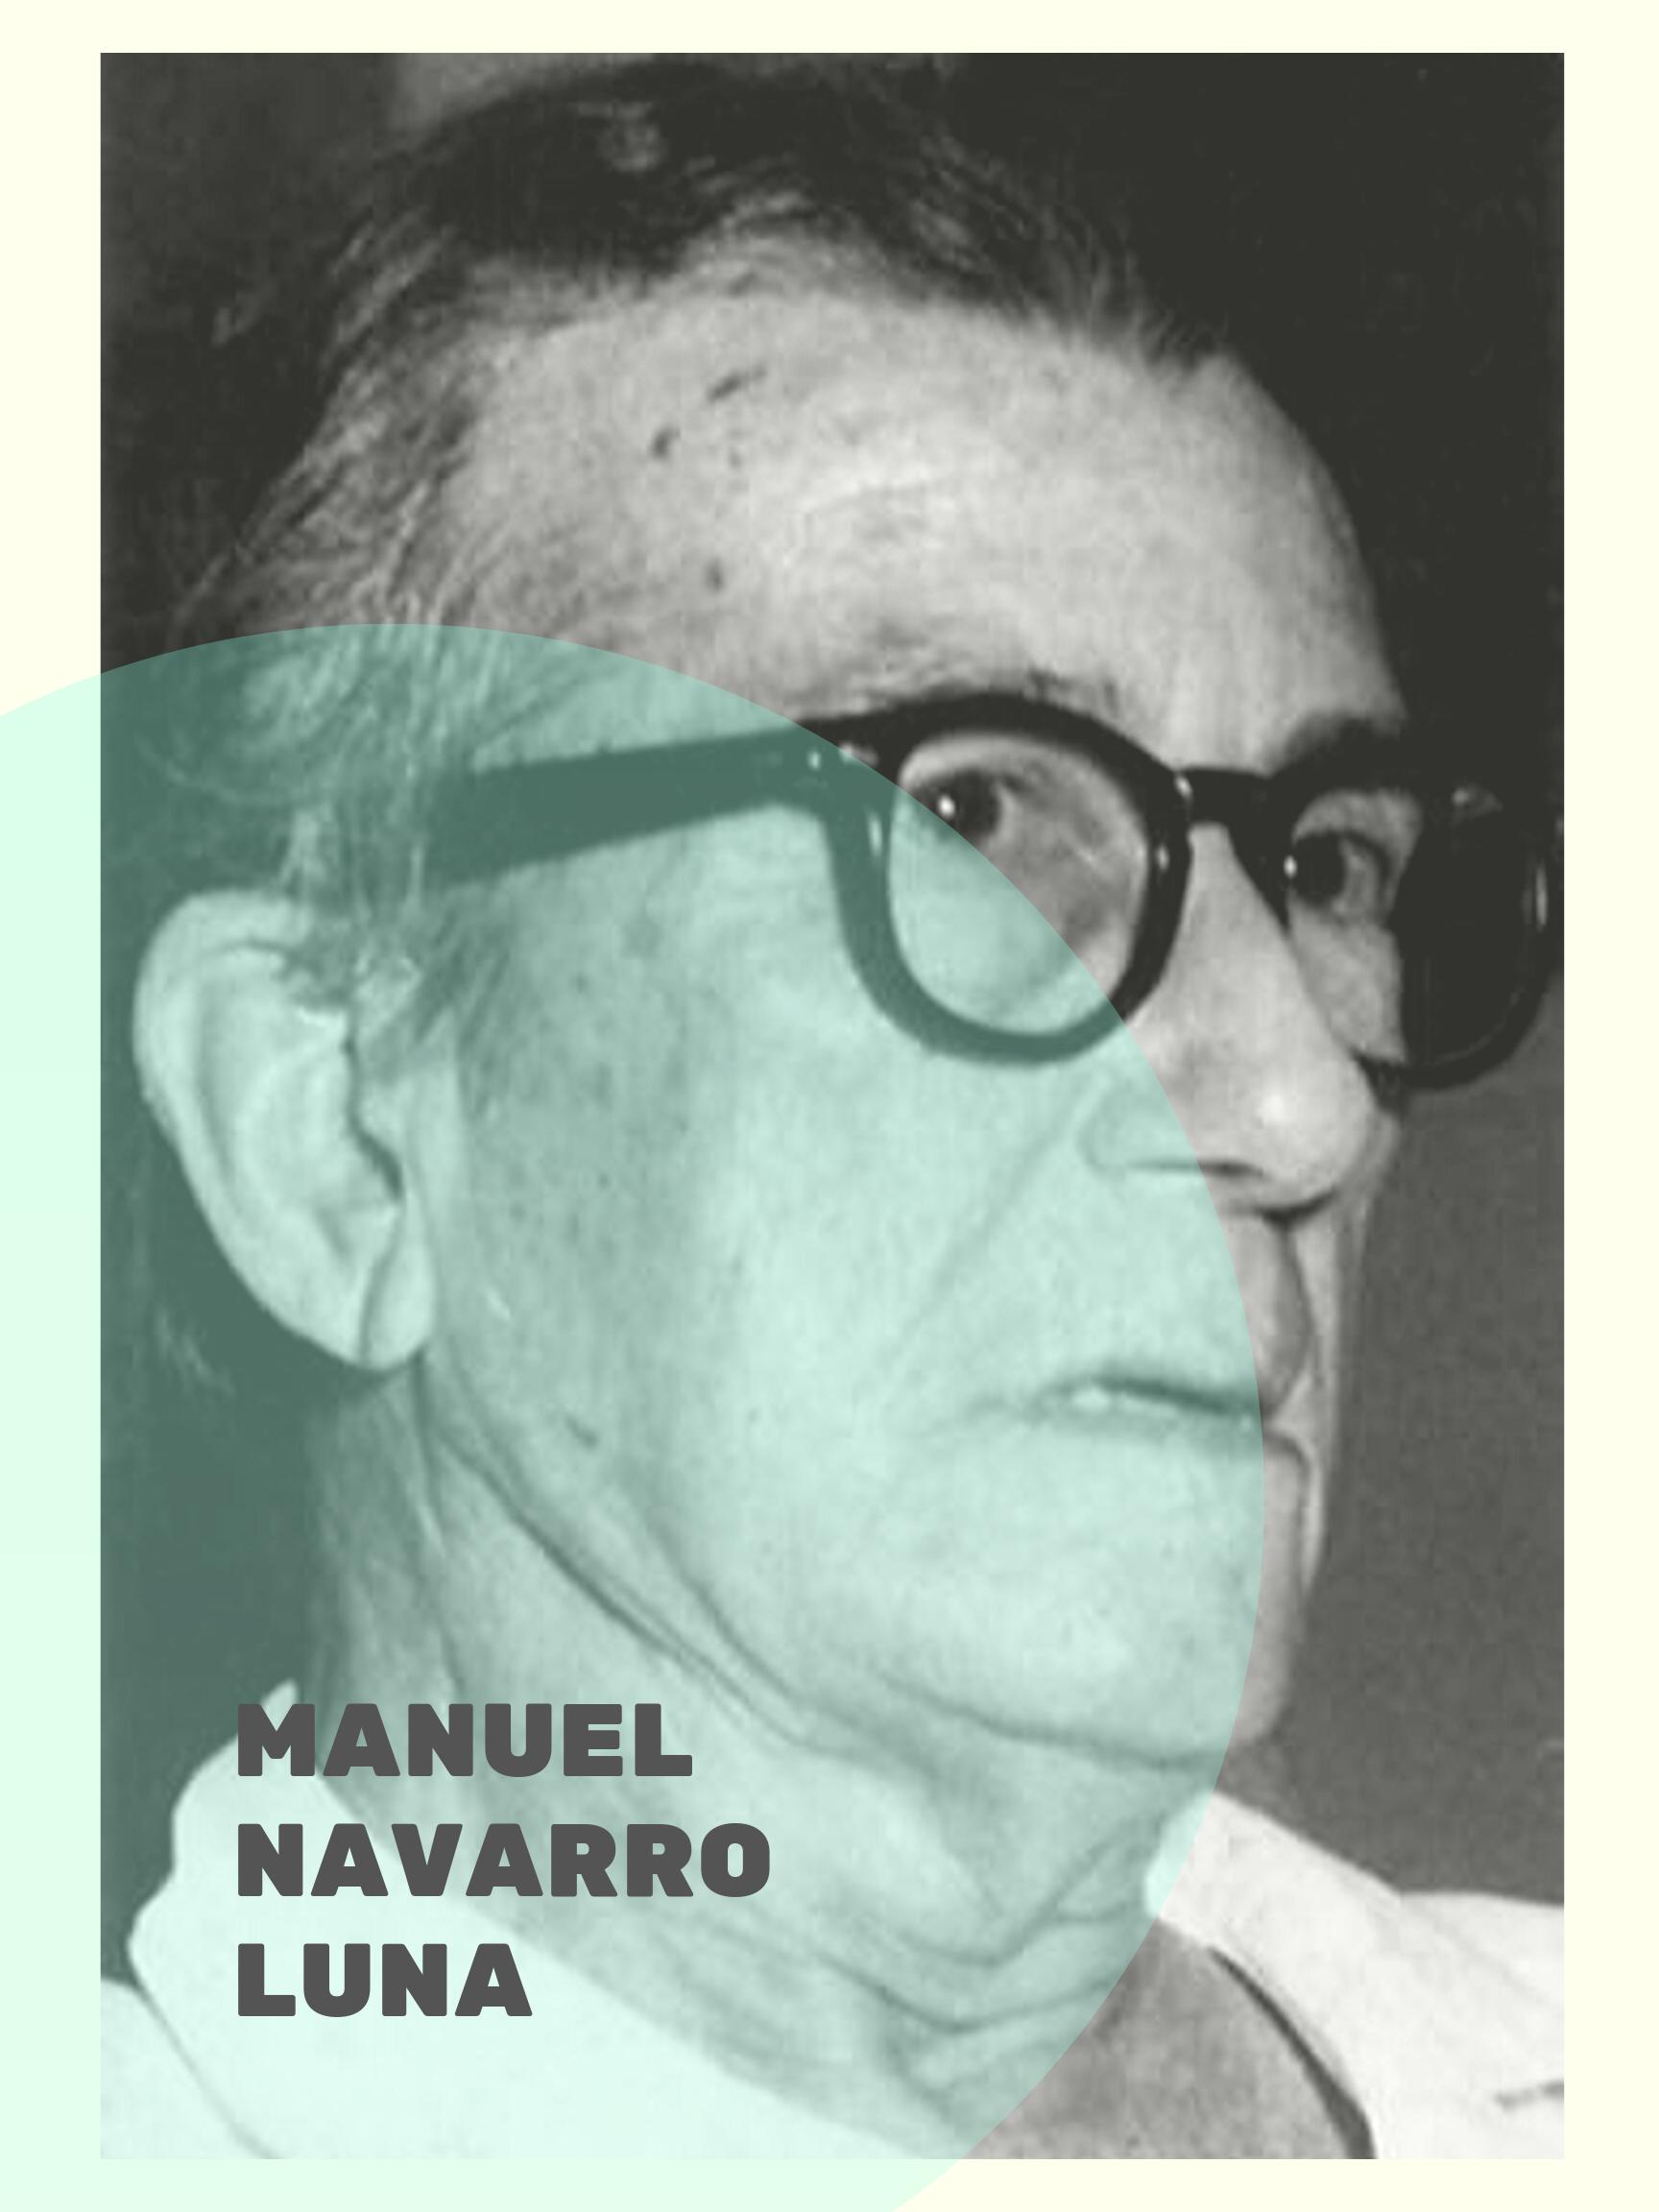 Manuel Navarro Luna